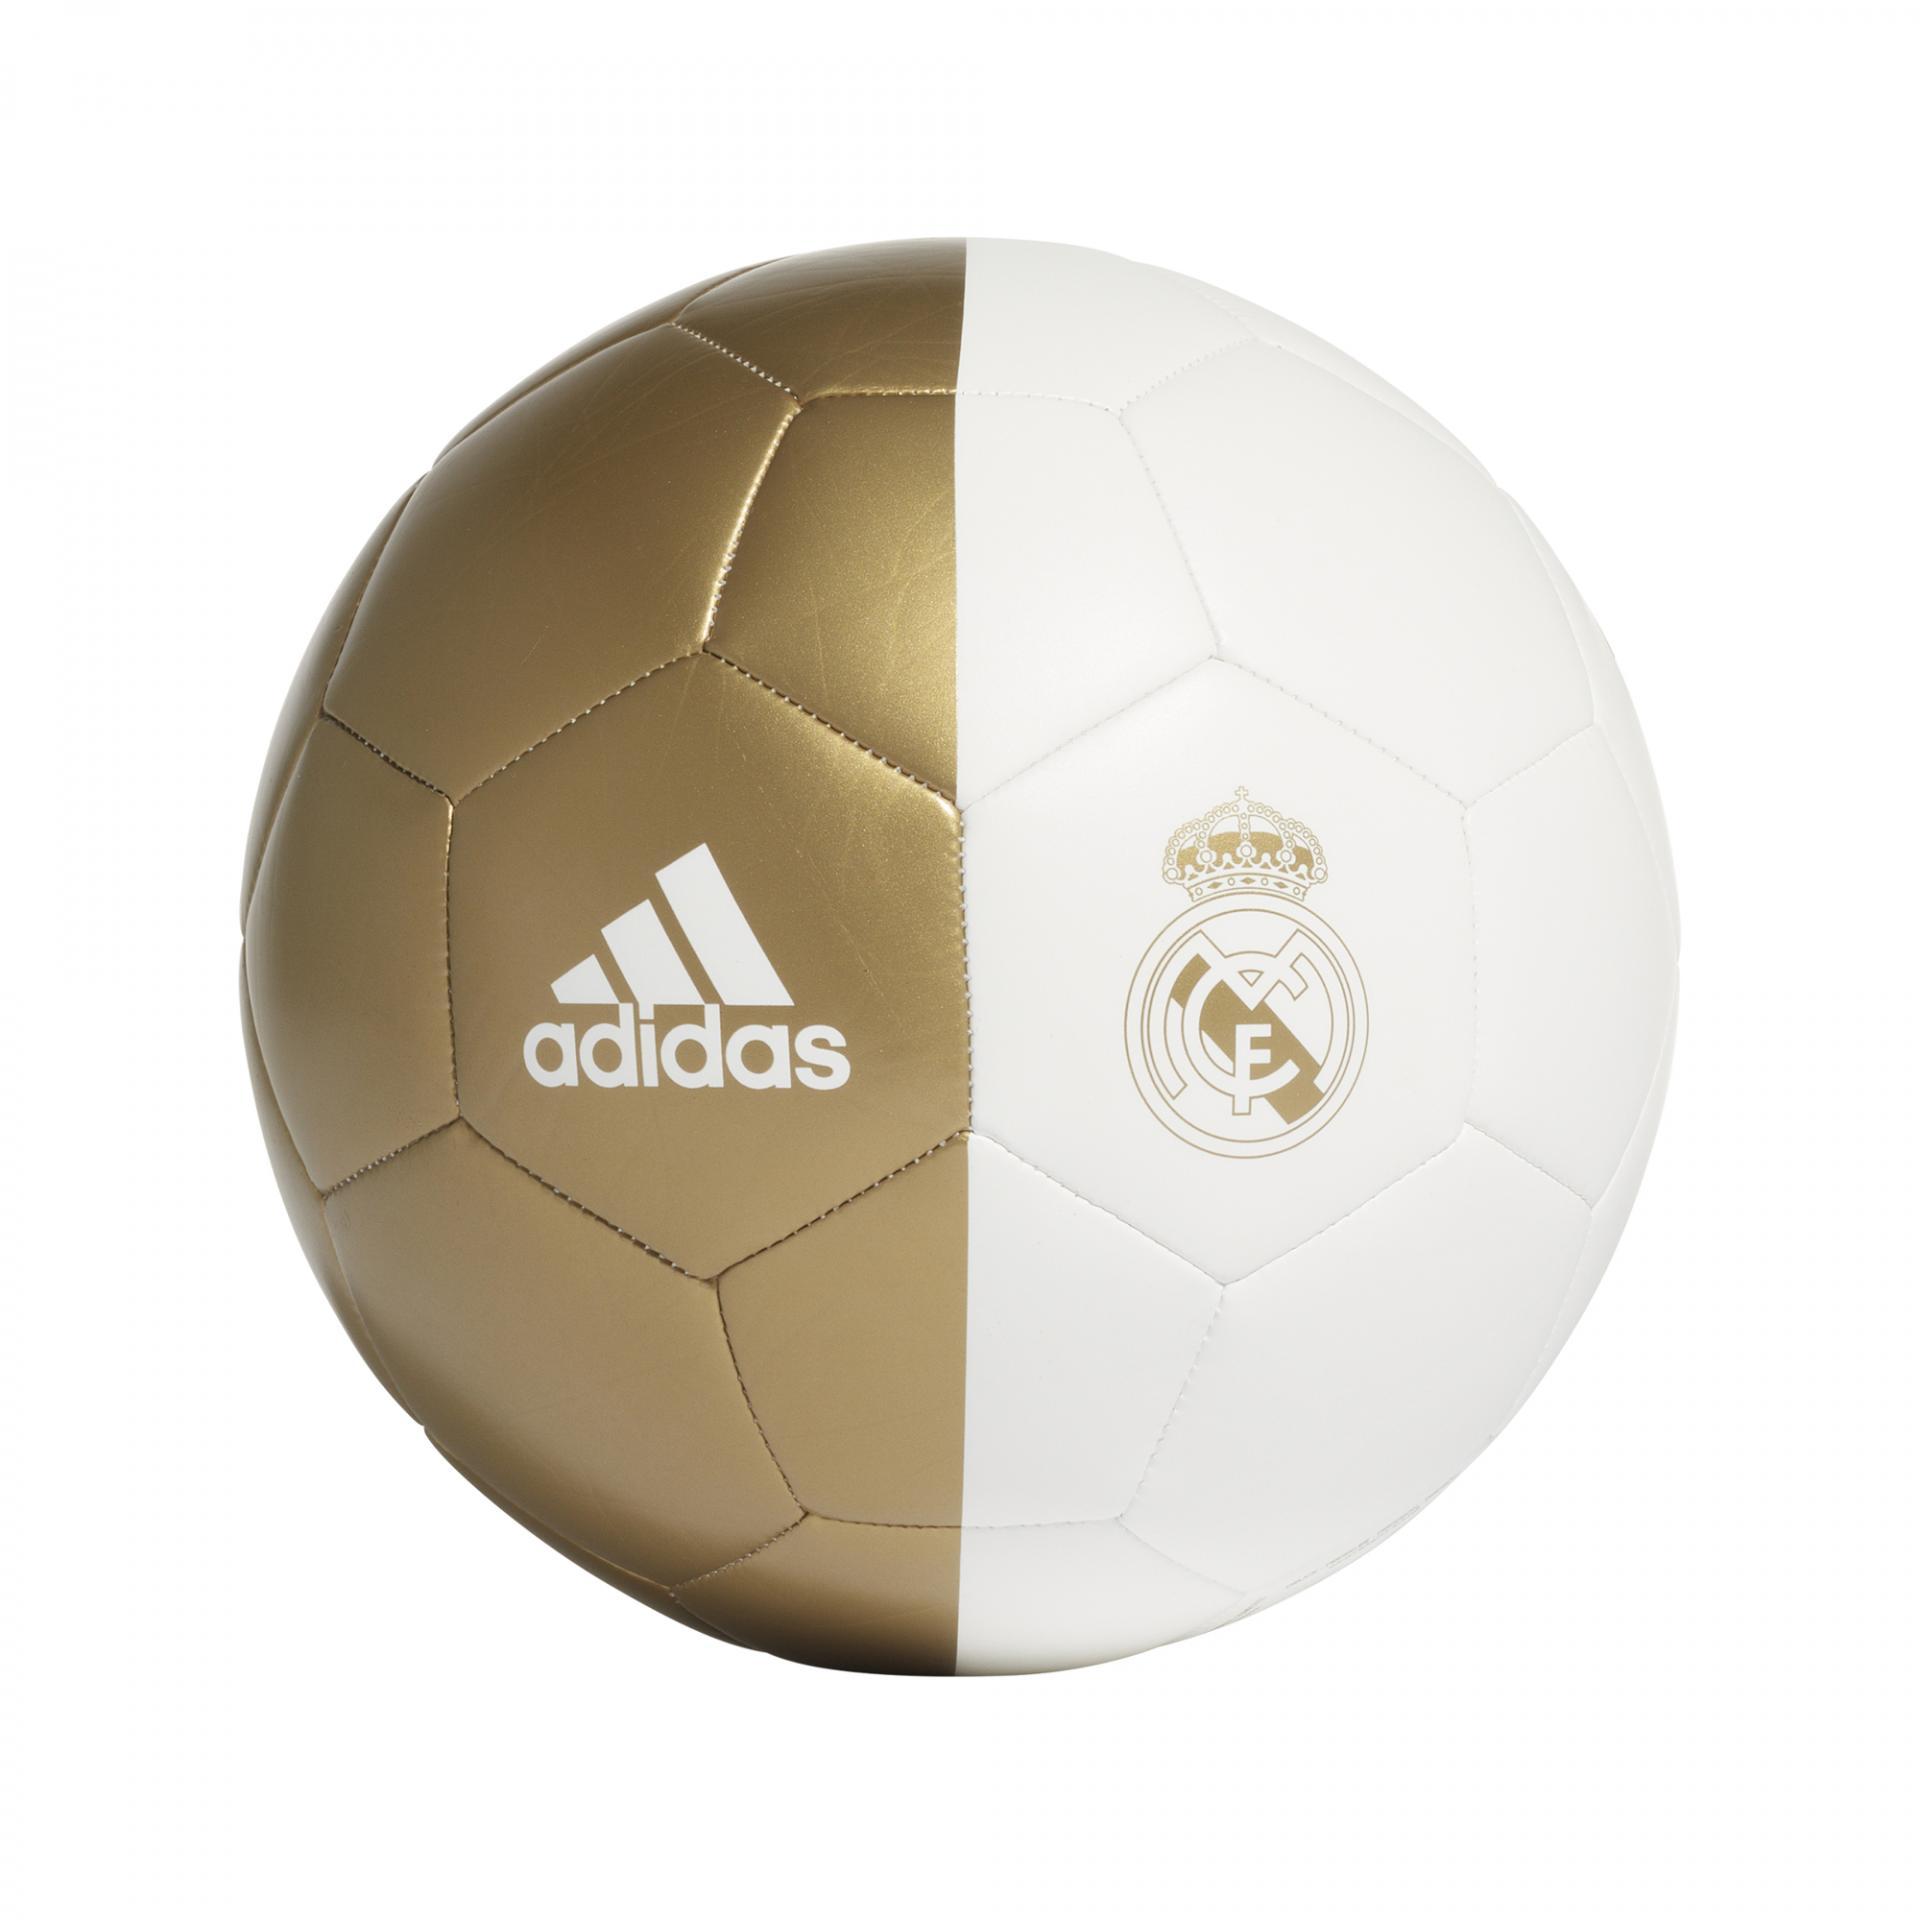 Balon Real Madrid DY2524 talla 5